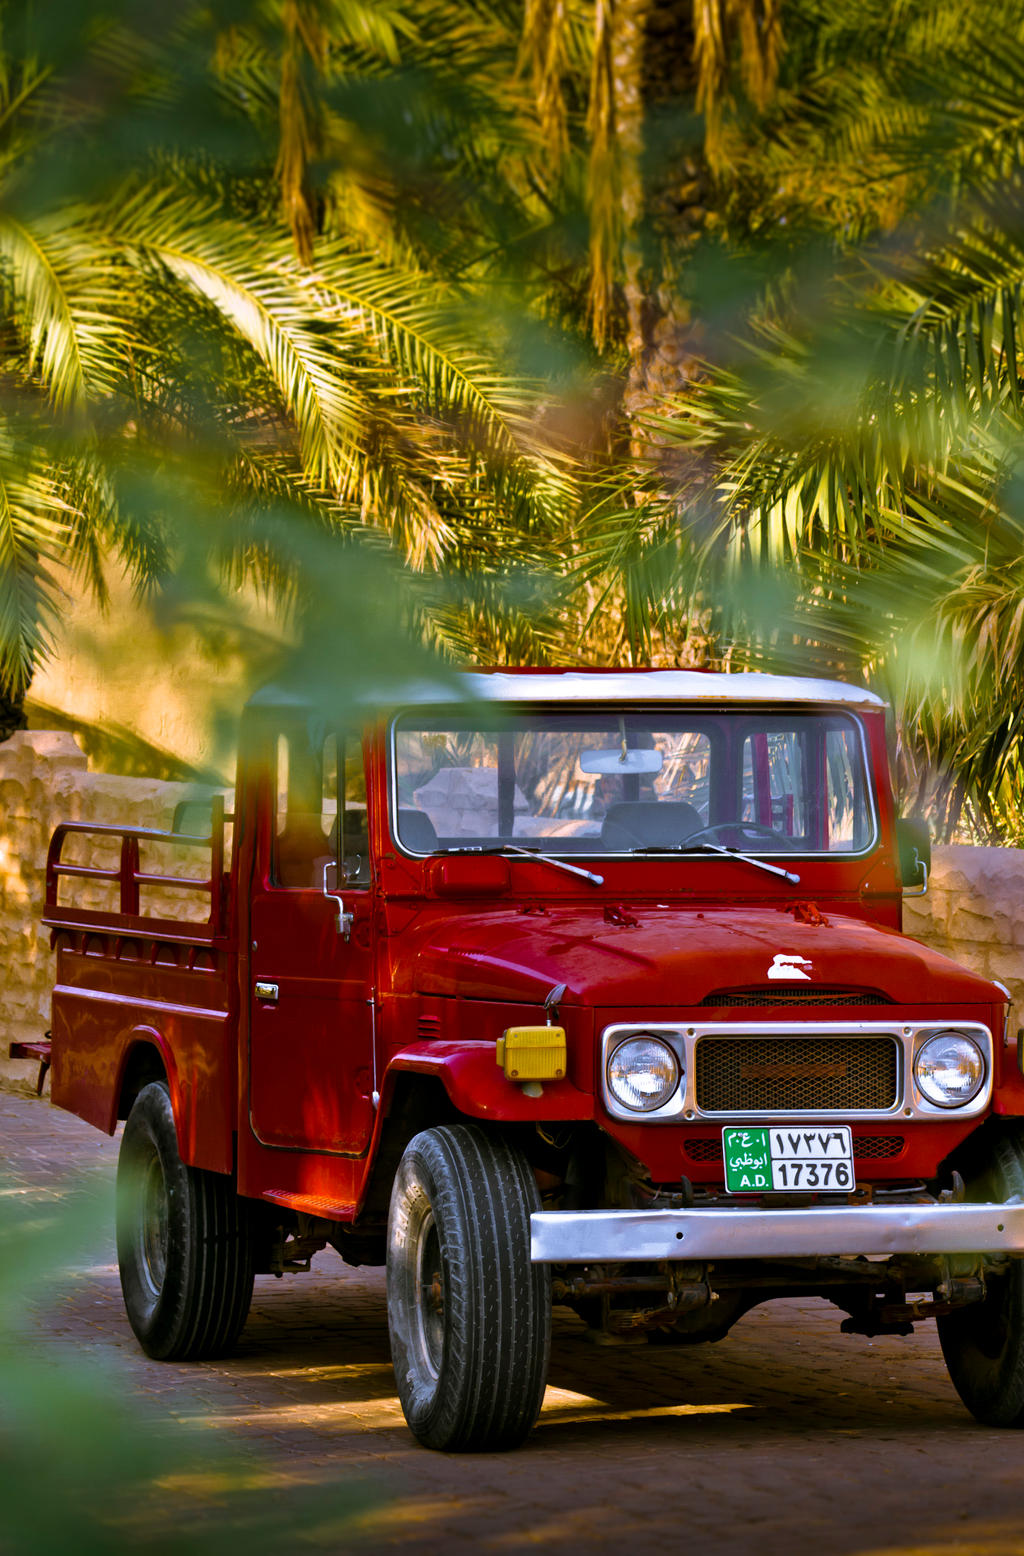 old toyota land cruiser pickup by jamesdubai on deviantart. Black Bedroom Furniture Sets. Home Design Ideas